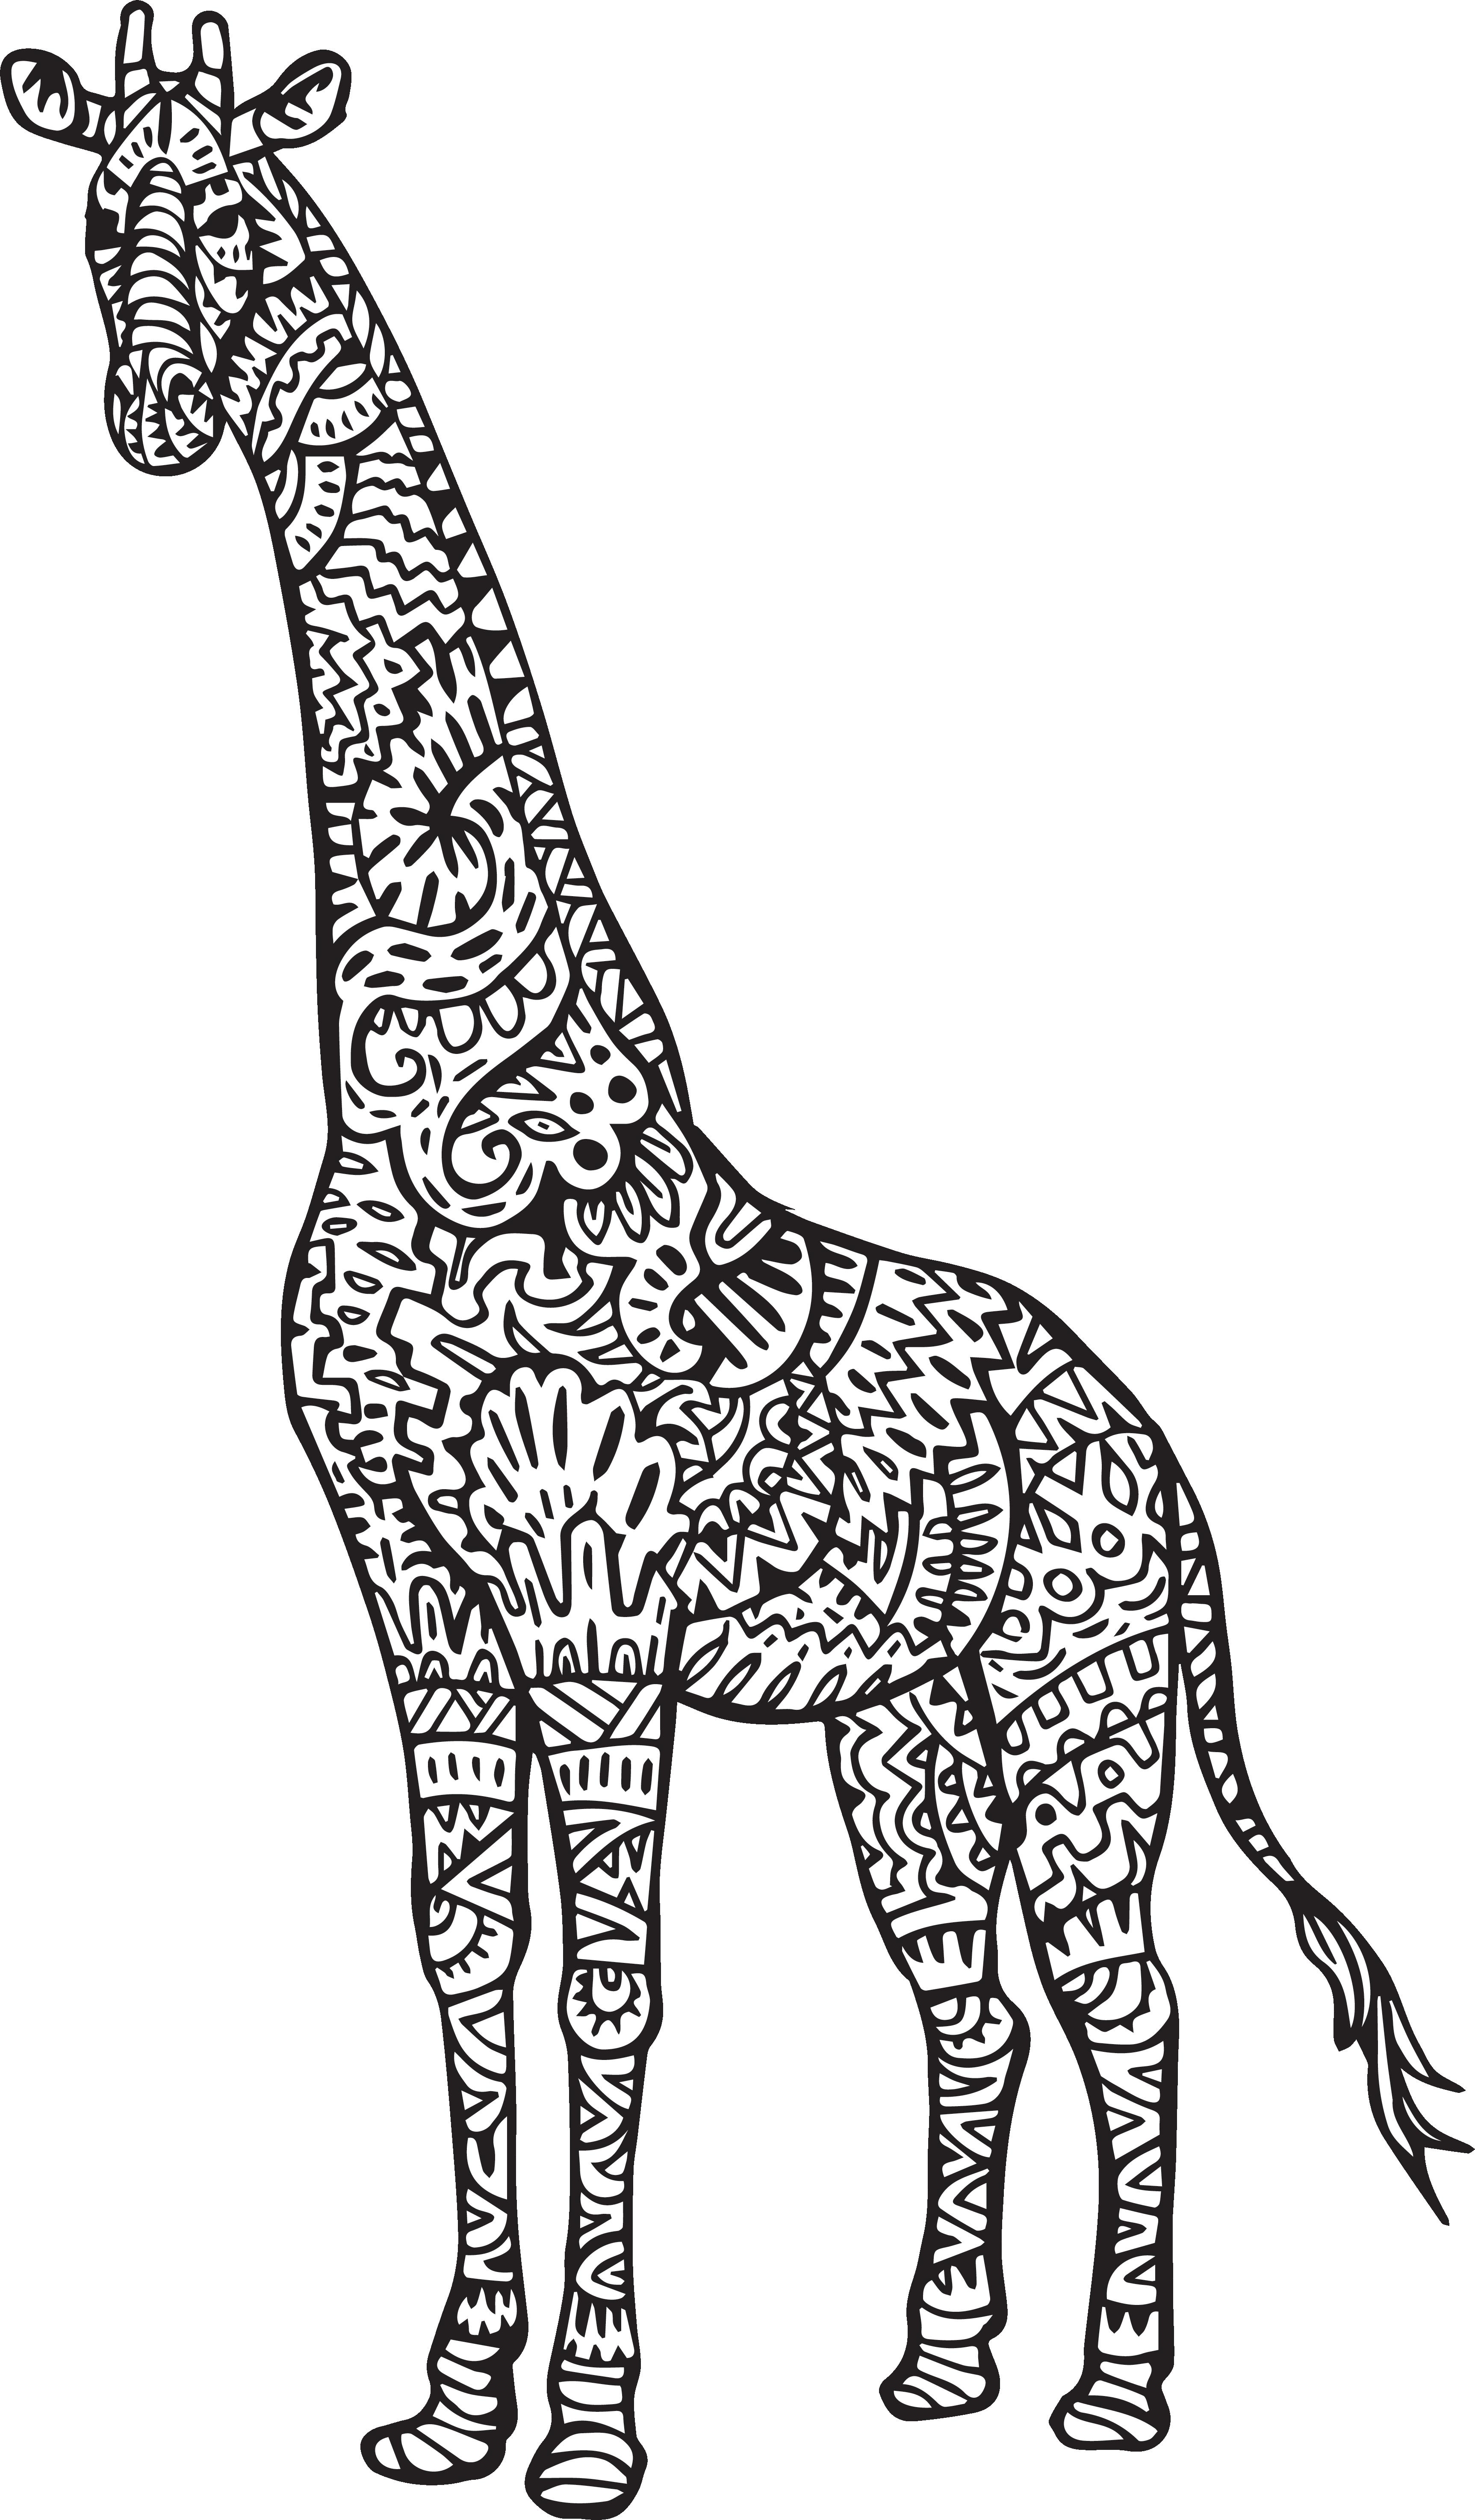 Coloring baby jokingart com. Family clipart giraffe